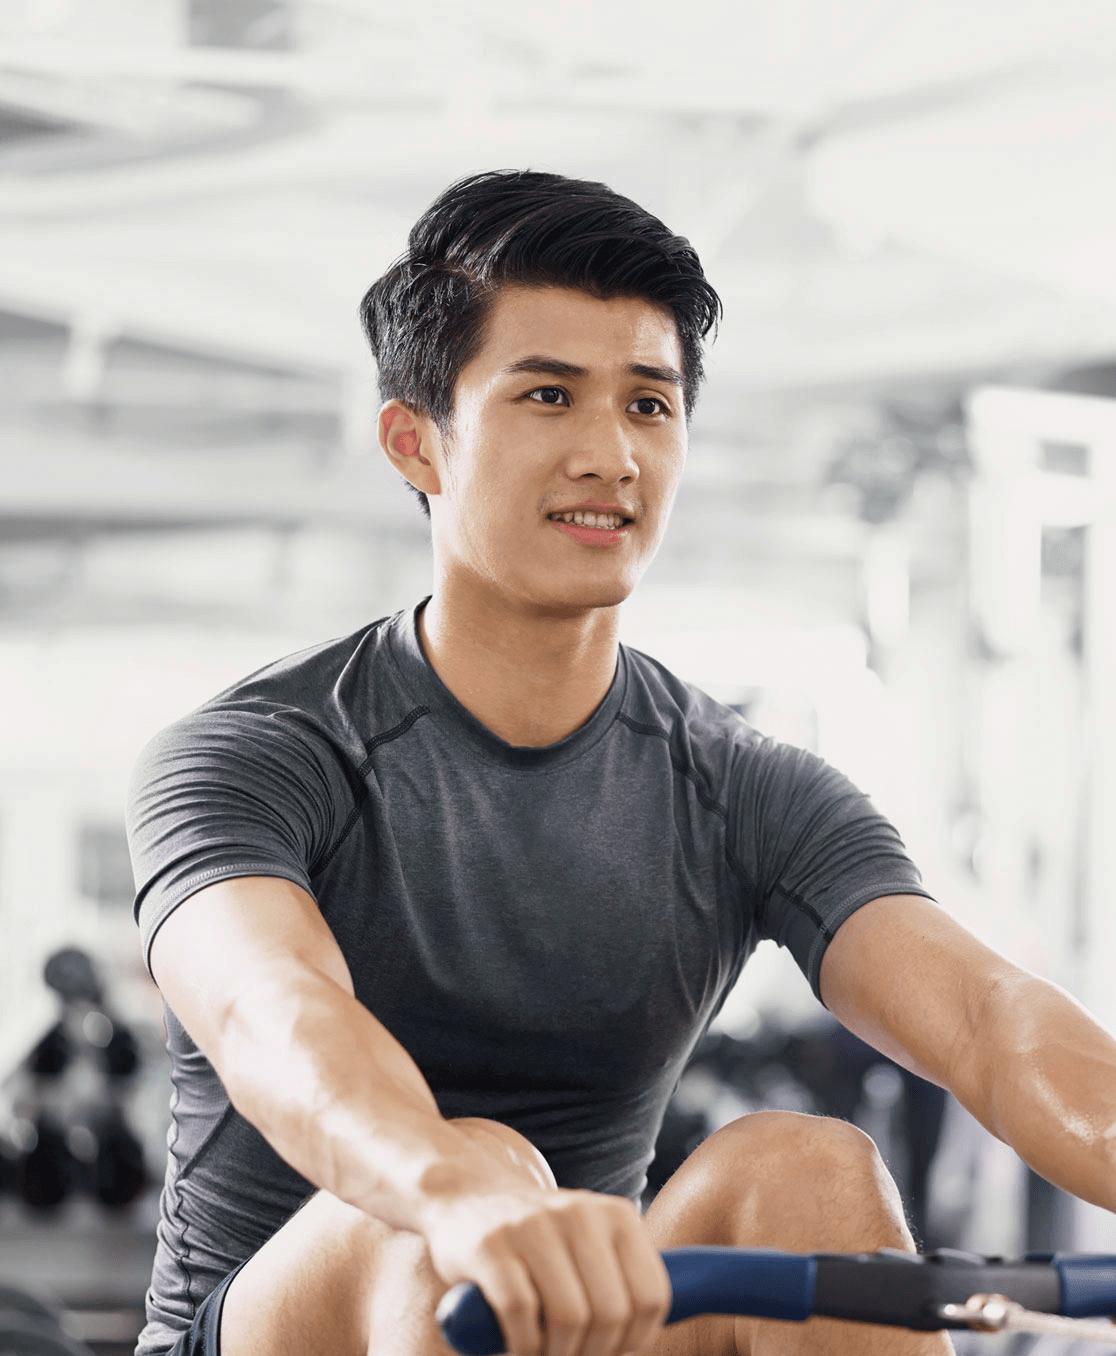 Man doing rowing maching at a gym